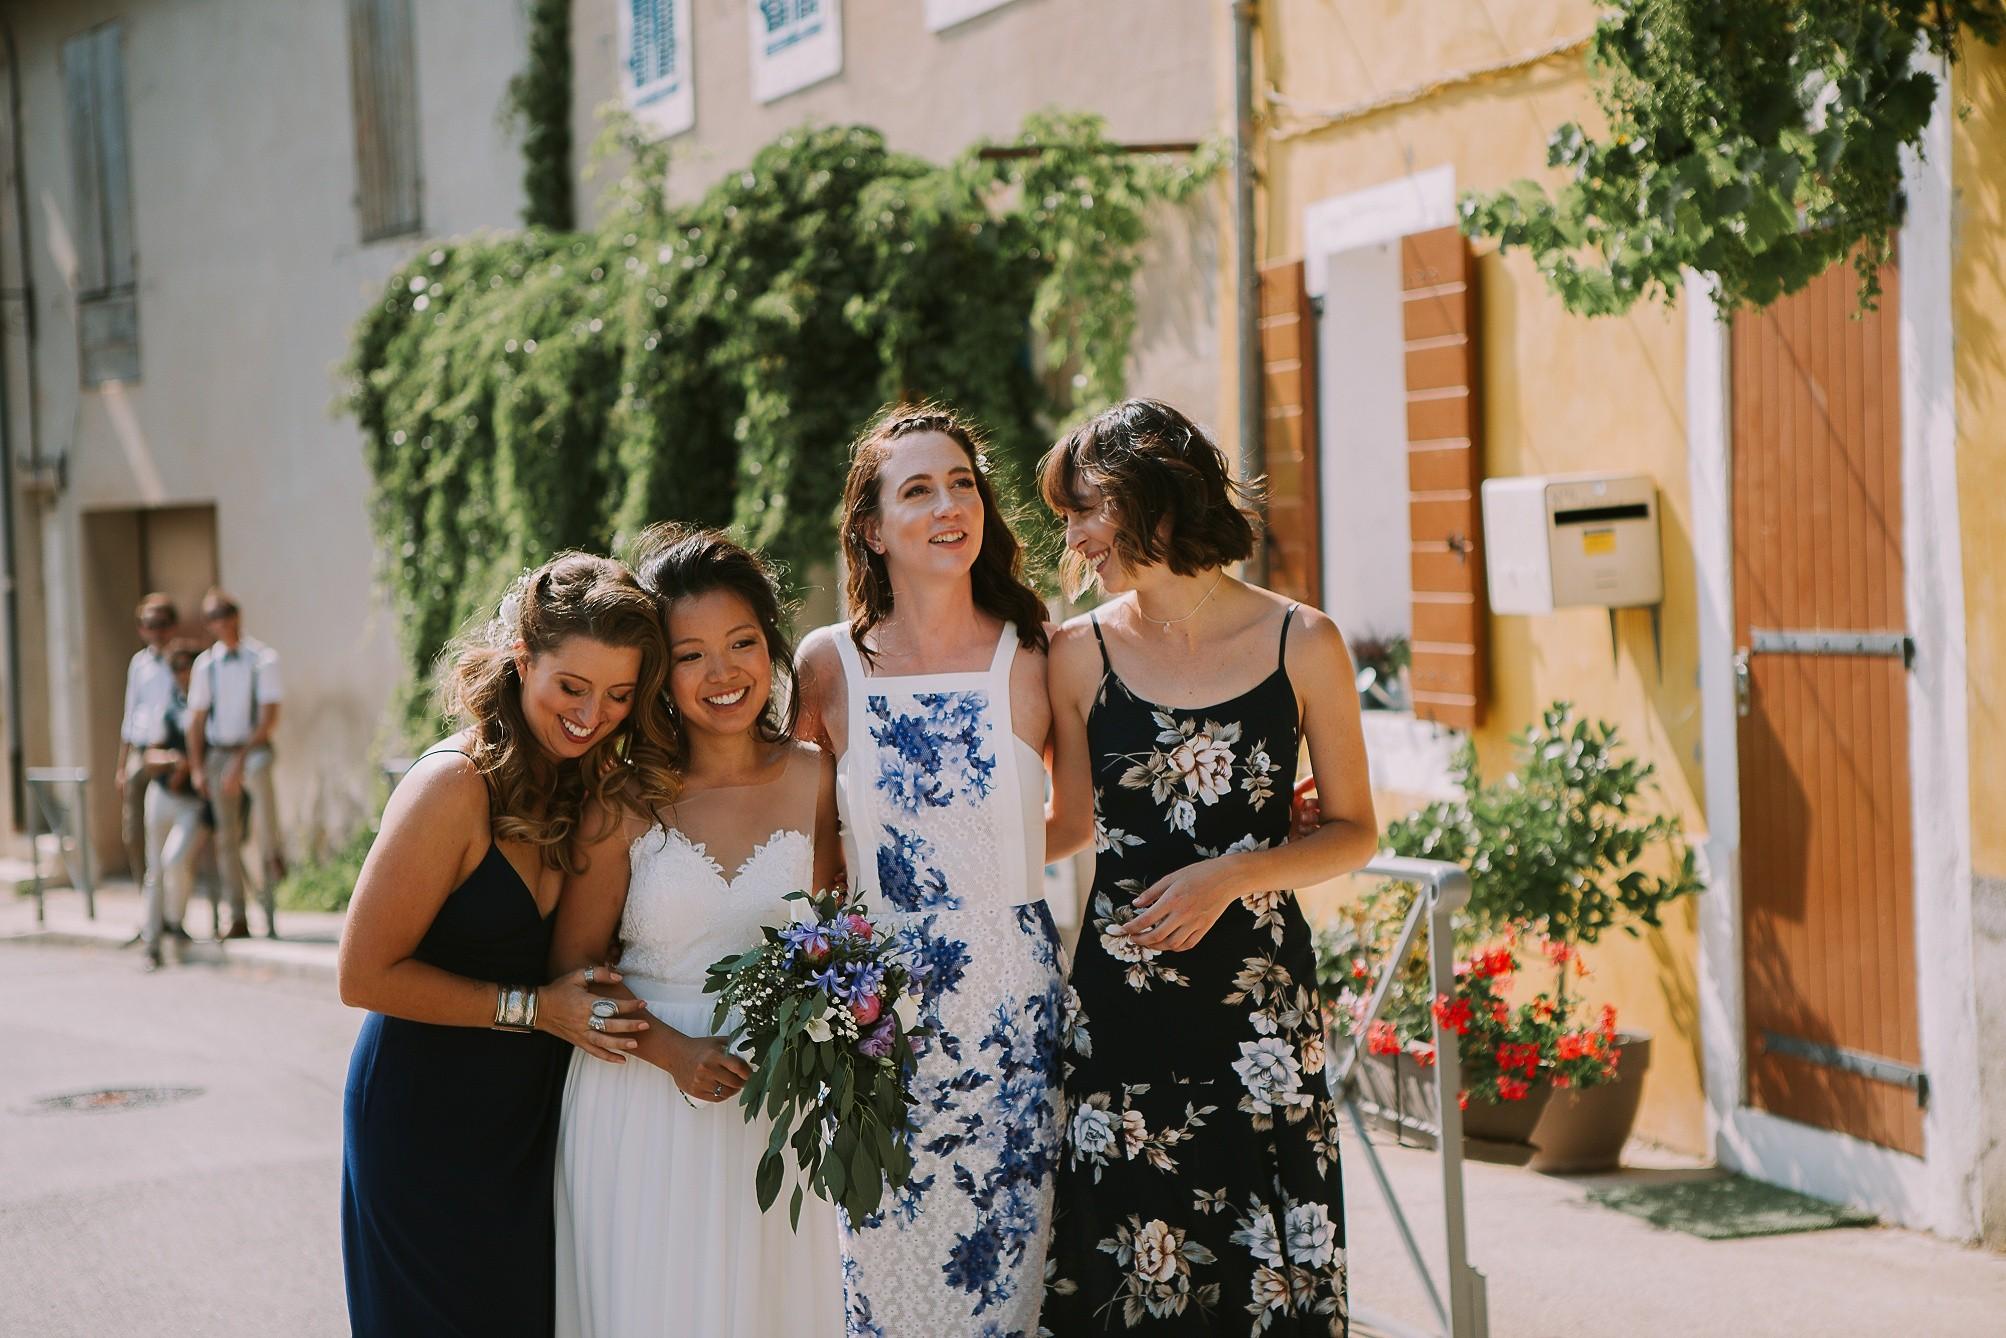 katerynaphotos-mariage-photographe-puyloubier-provence-aix-en-provence-sud-de-la-france_0378.jpg